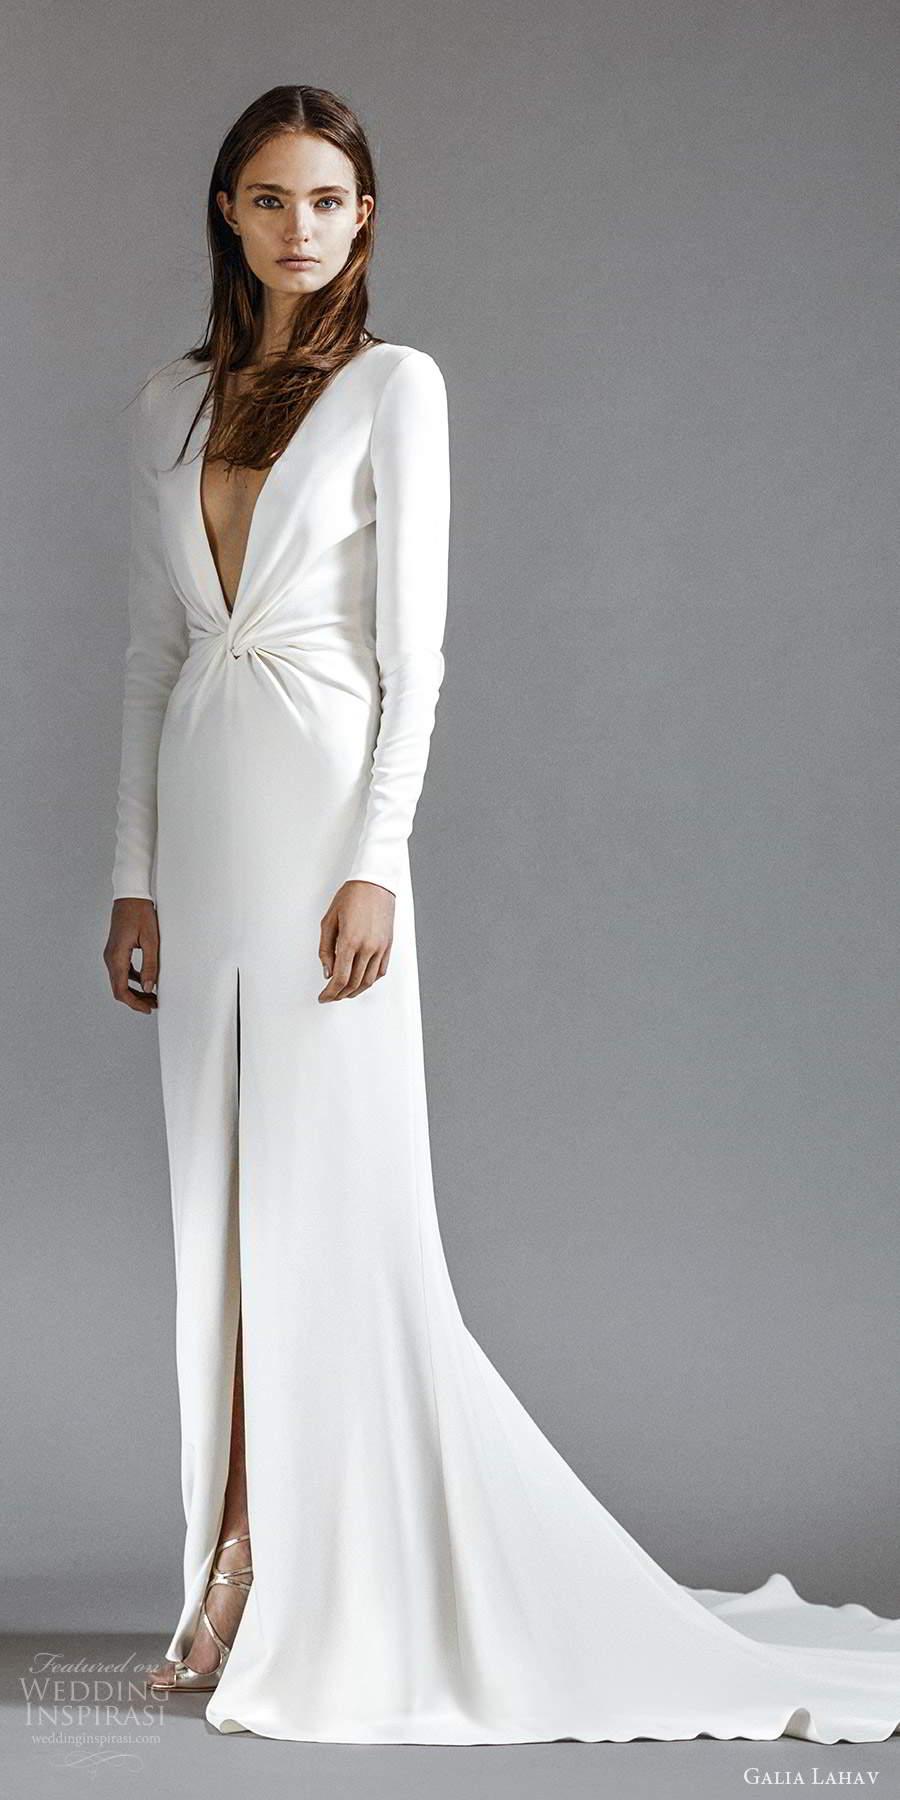 galia lahav 2021 rtw bridal long sleeves plunging v neckline clean minimalist column modified a line wedding dress chapel train (1) sv